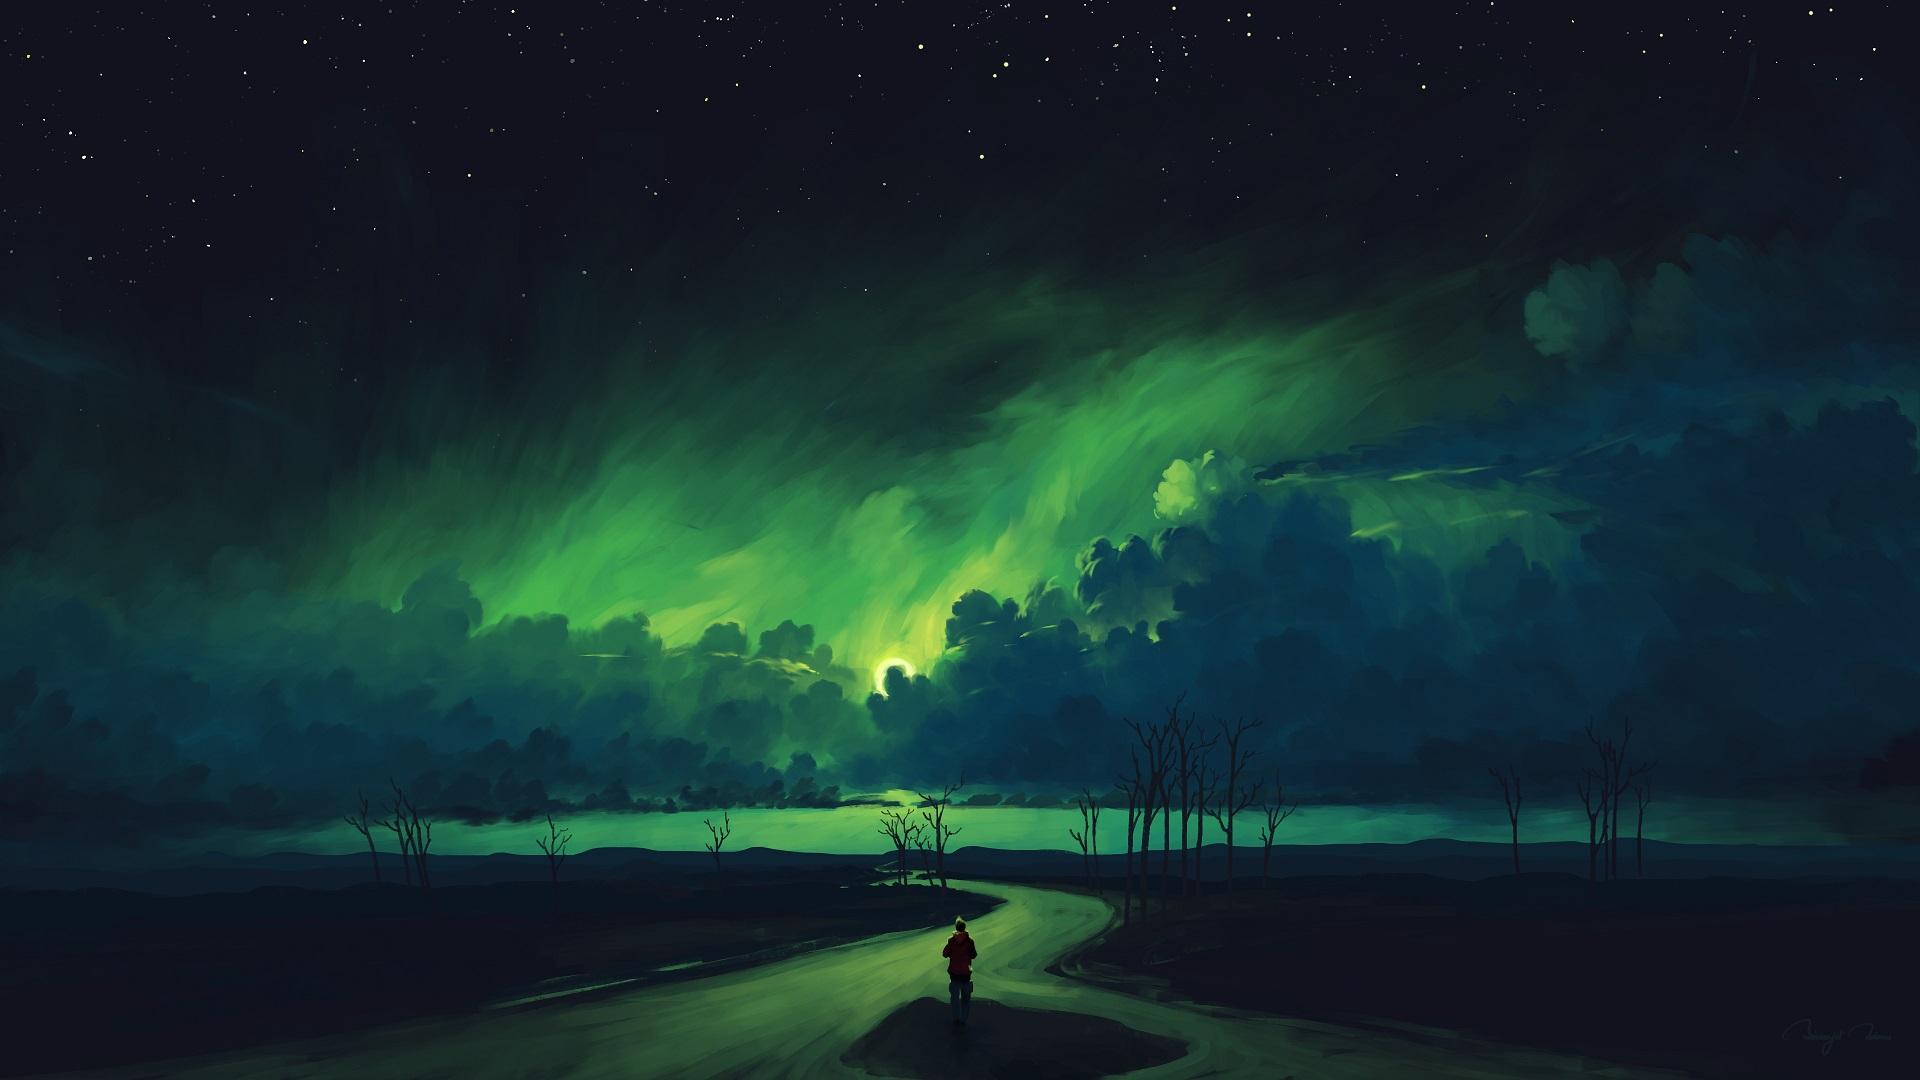 General 1920x1080 digital painting landscape sky night clouds aurorae BisBiswas